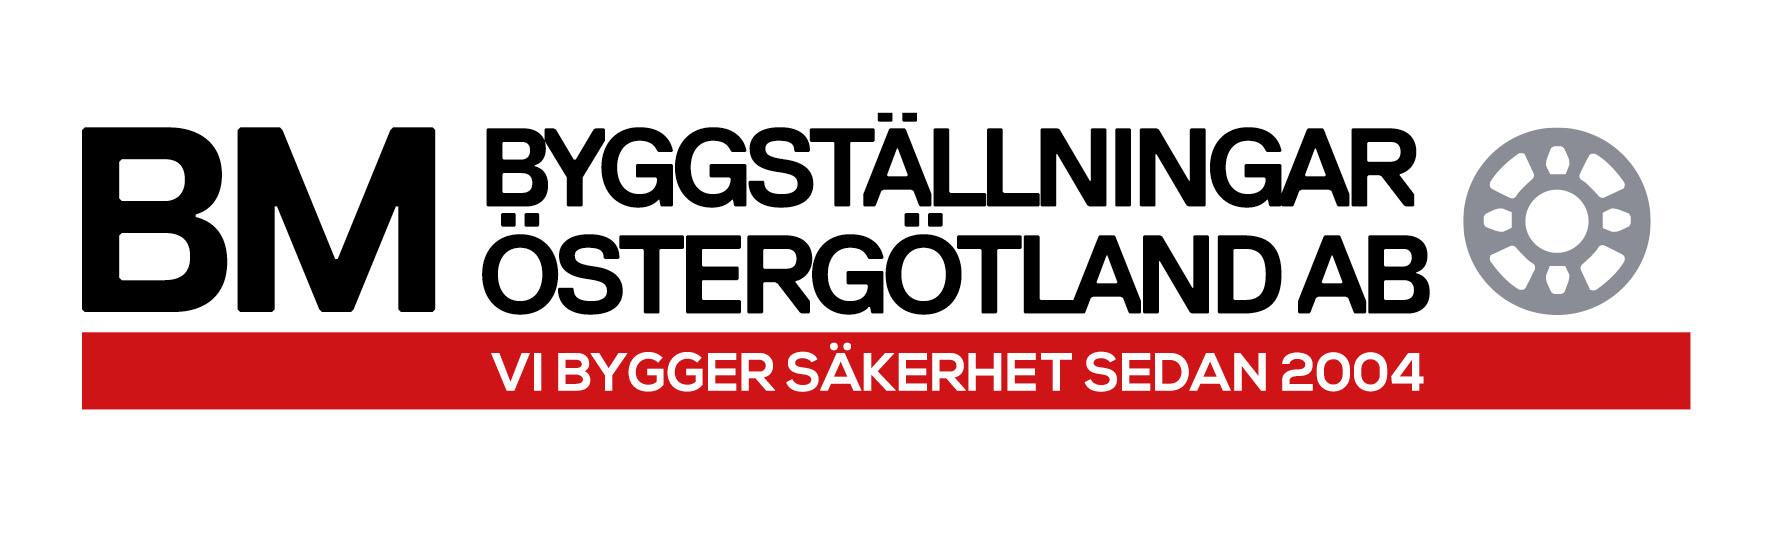 BM Byggställningar i Östergötland AB